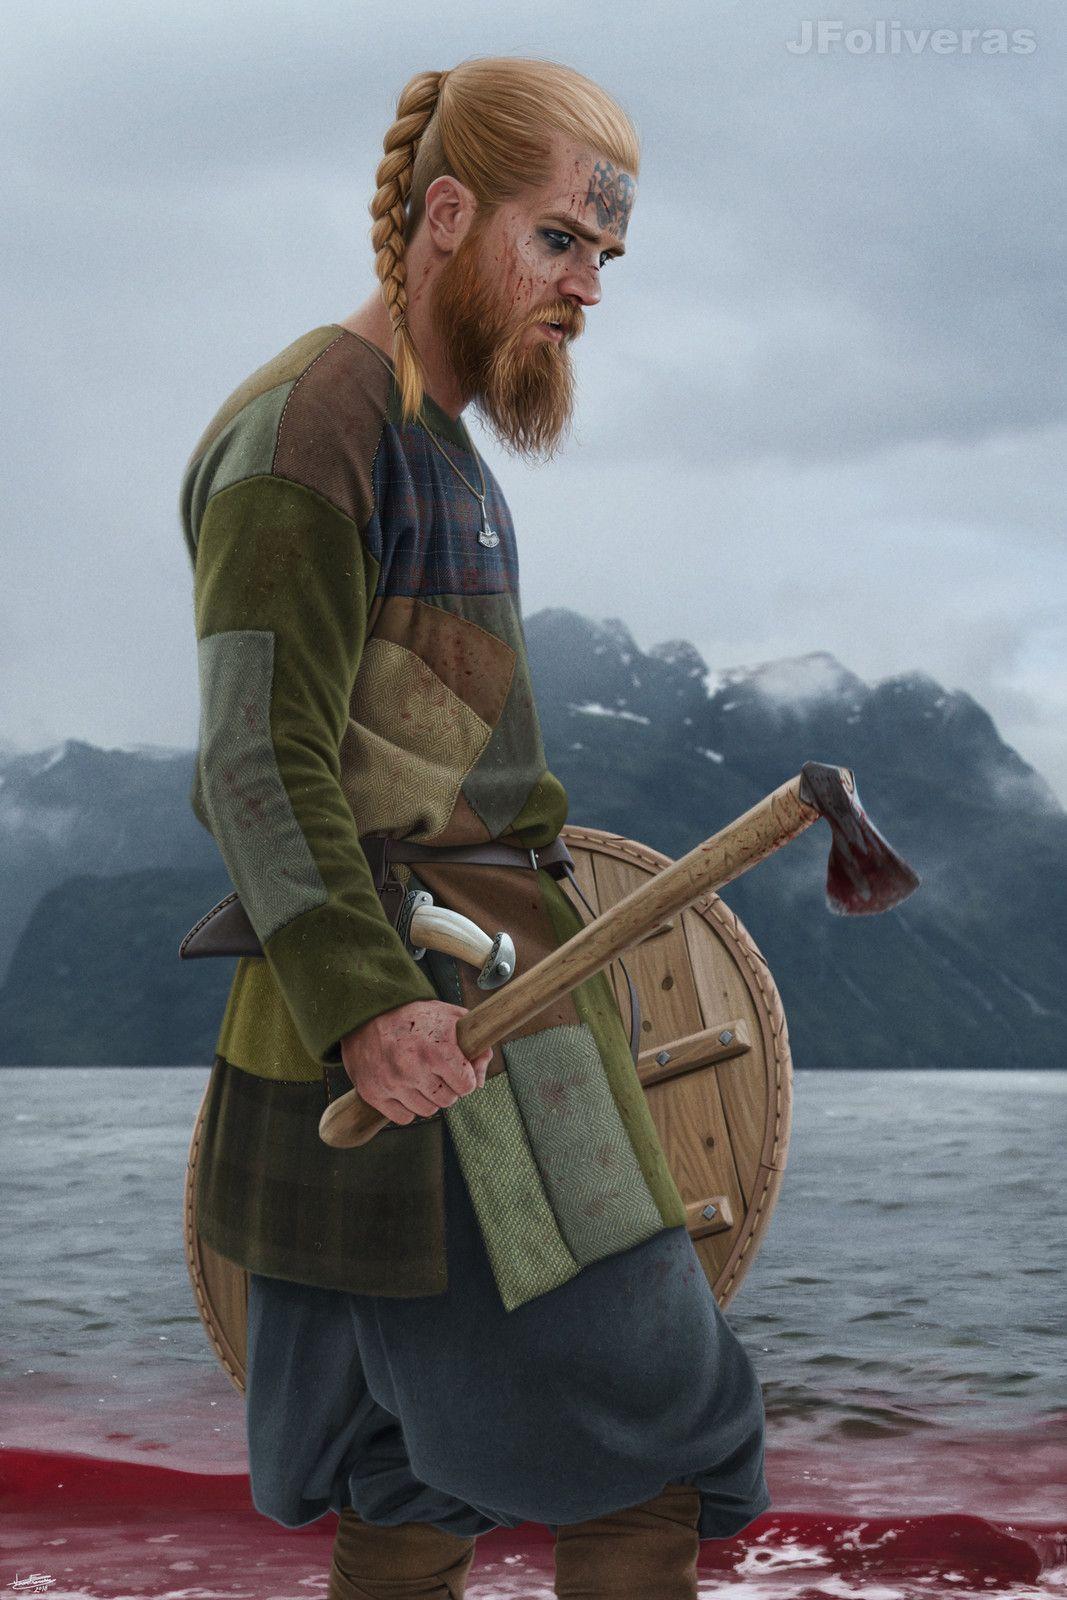 Norse Warrior Joan Francesc Oliveras Pallerols On Artstation At Https Www Artstation Com Artwork Pwz38 Norse Viking Character Ancient Warriors